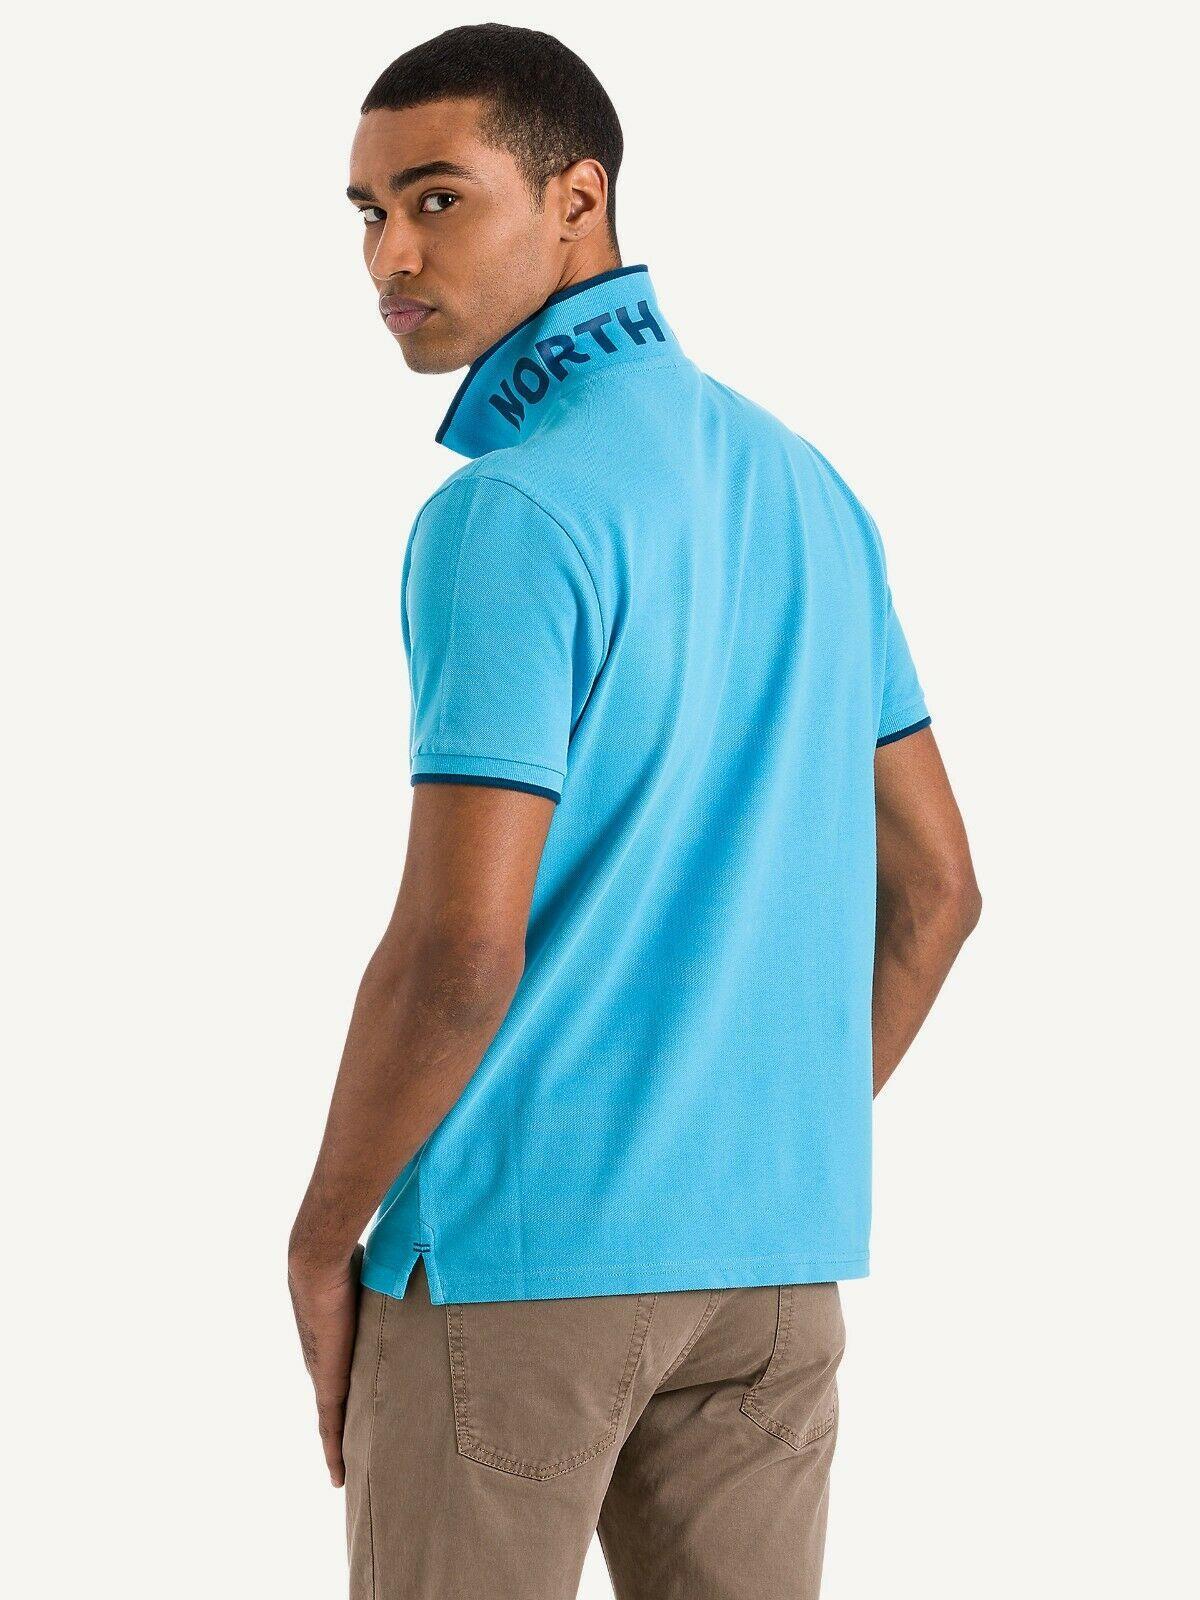 NORTH-SAILS-Mens-Legacy-Heritage-Short-Sleeve-Polo-Shirt-SALE-RRP-50 thumbnail 79